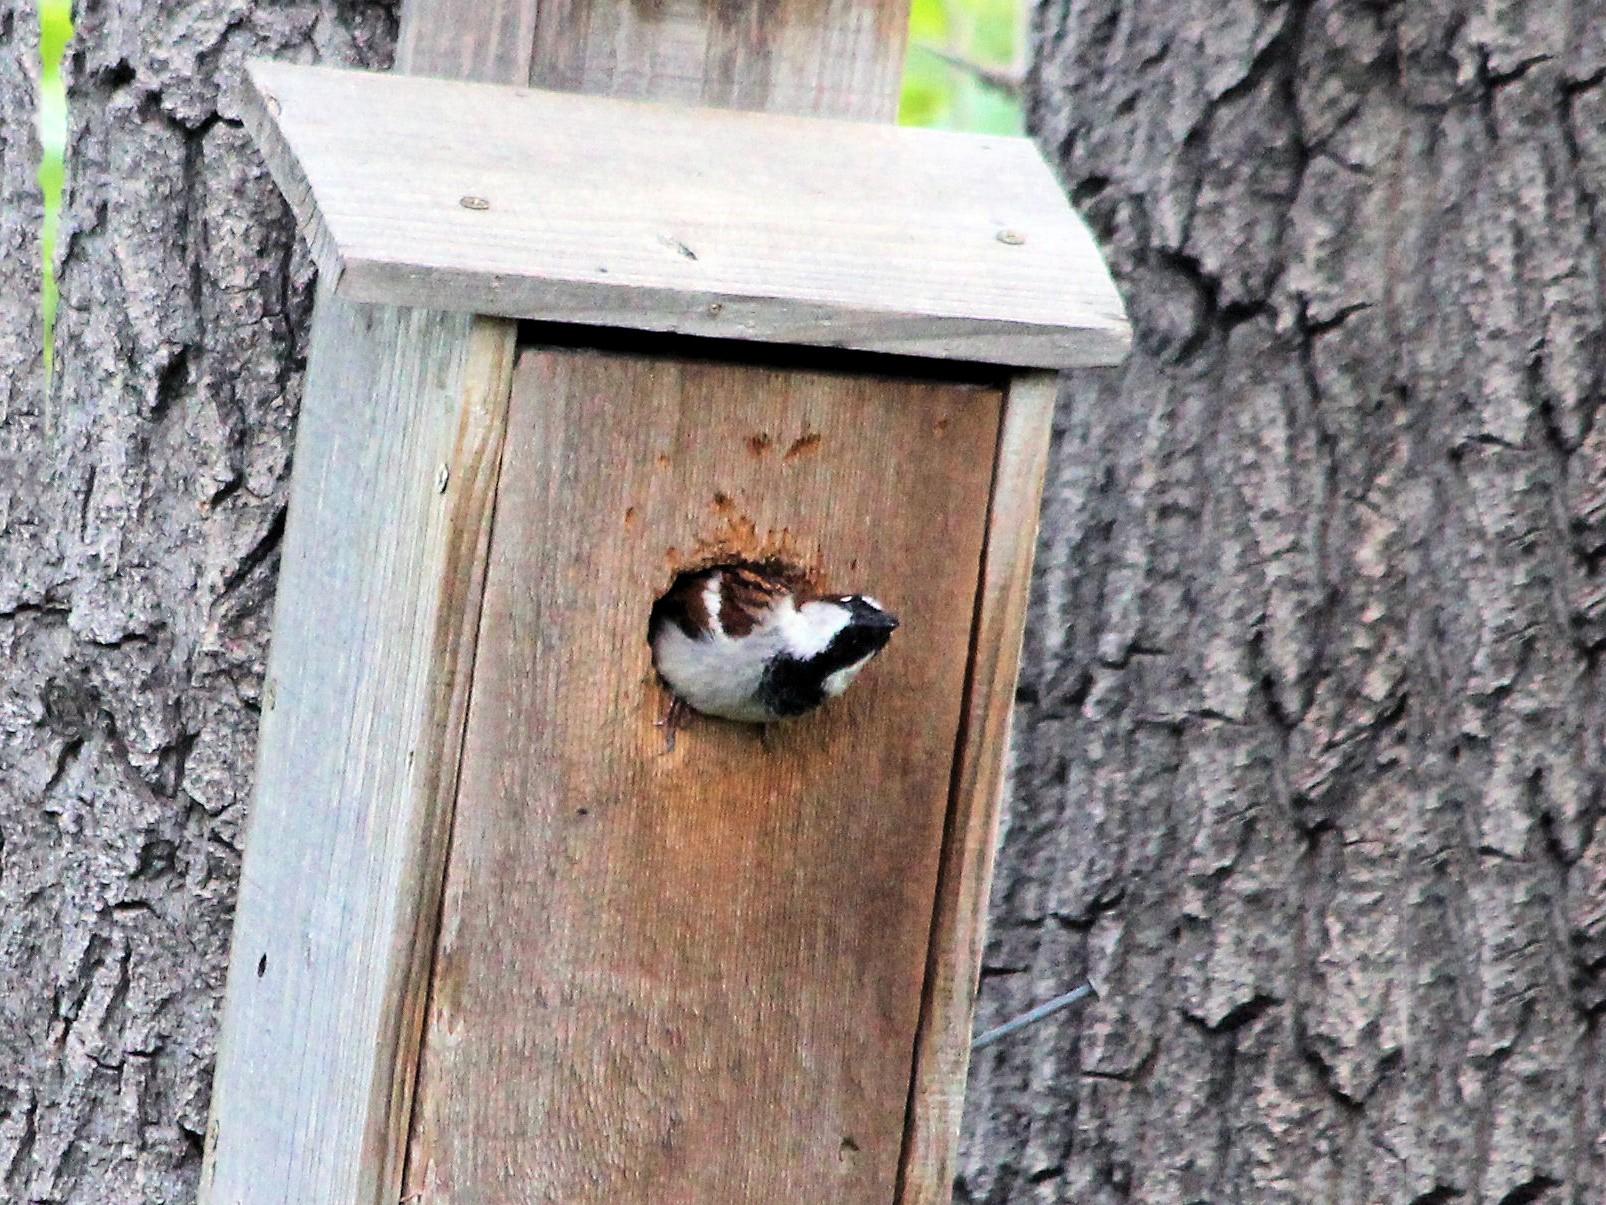 House Sparrow - Lorraine Lanning